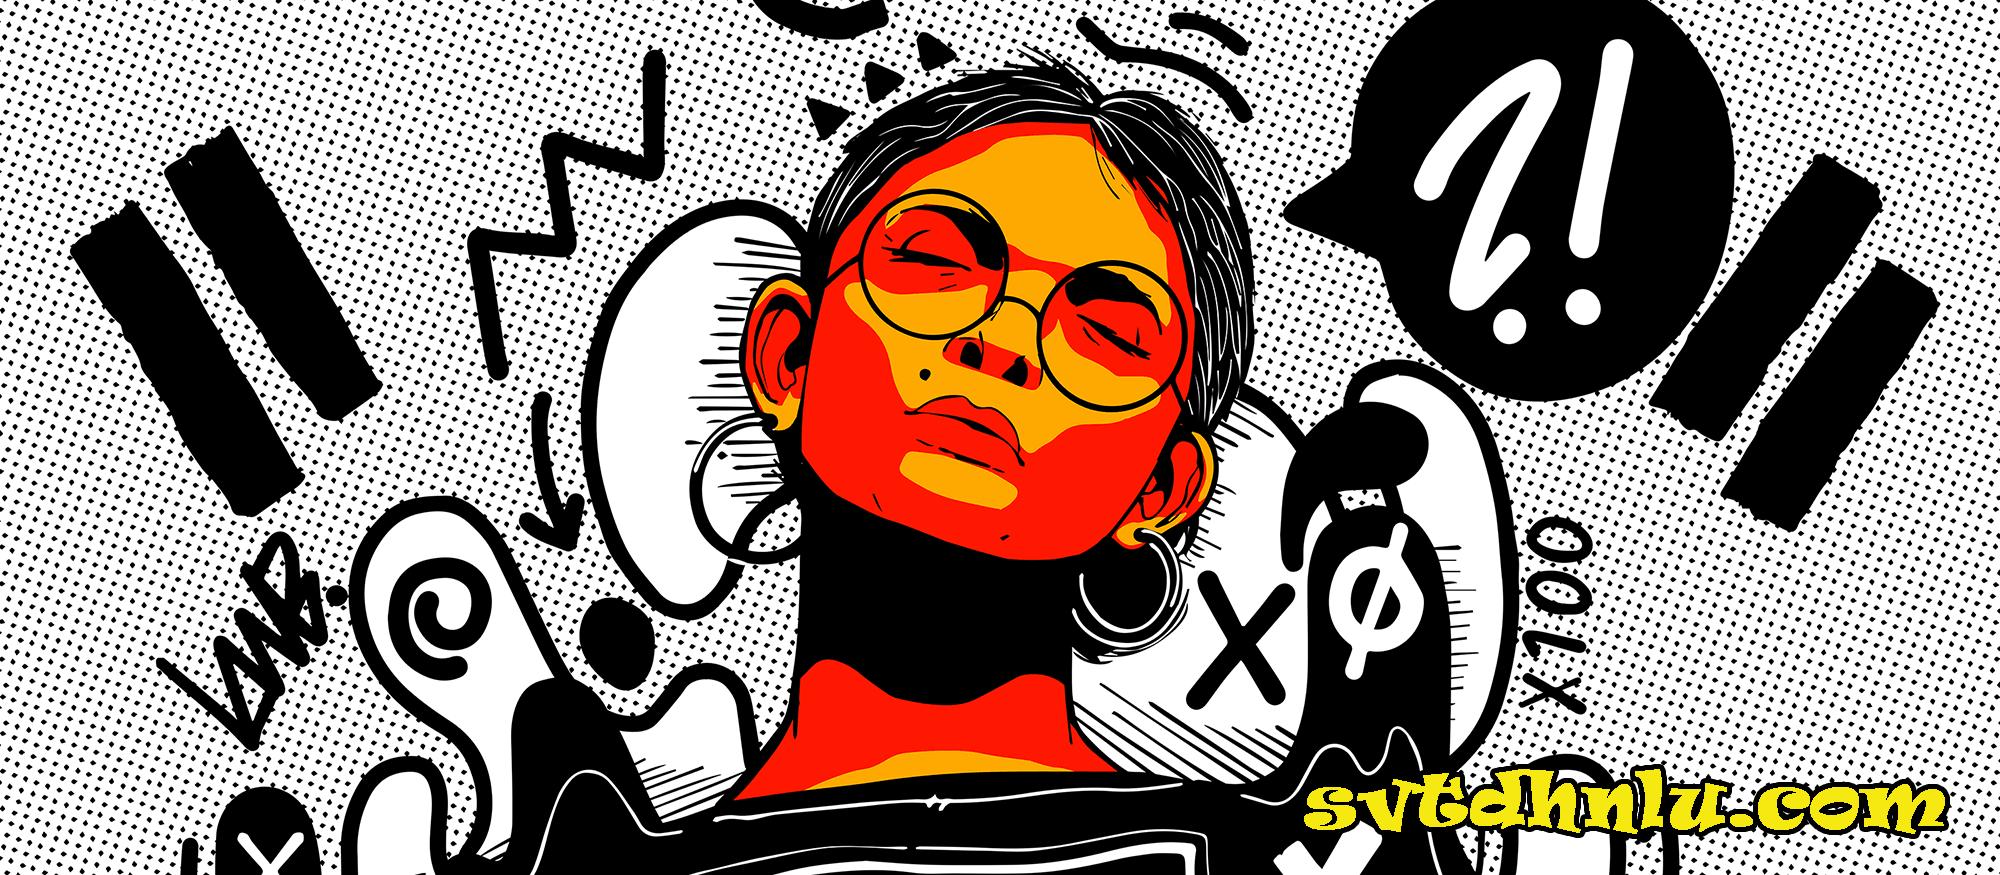 Download Adobe Illustrator CC 2019 Full Crack Mới Nhất